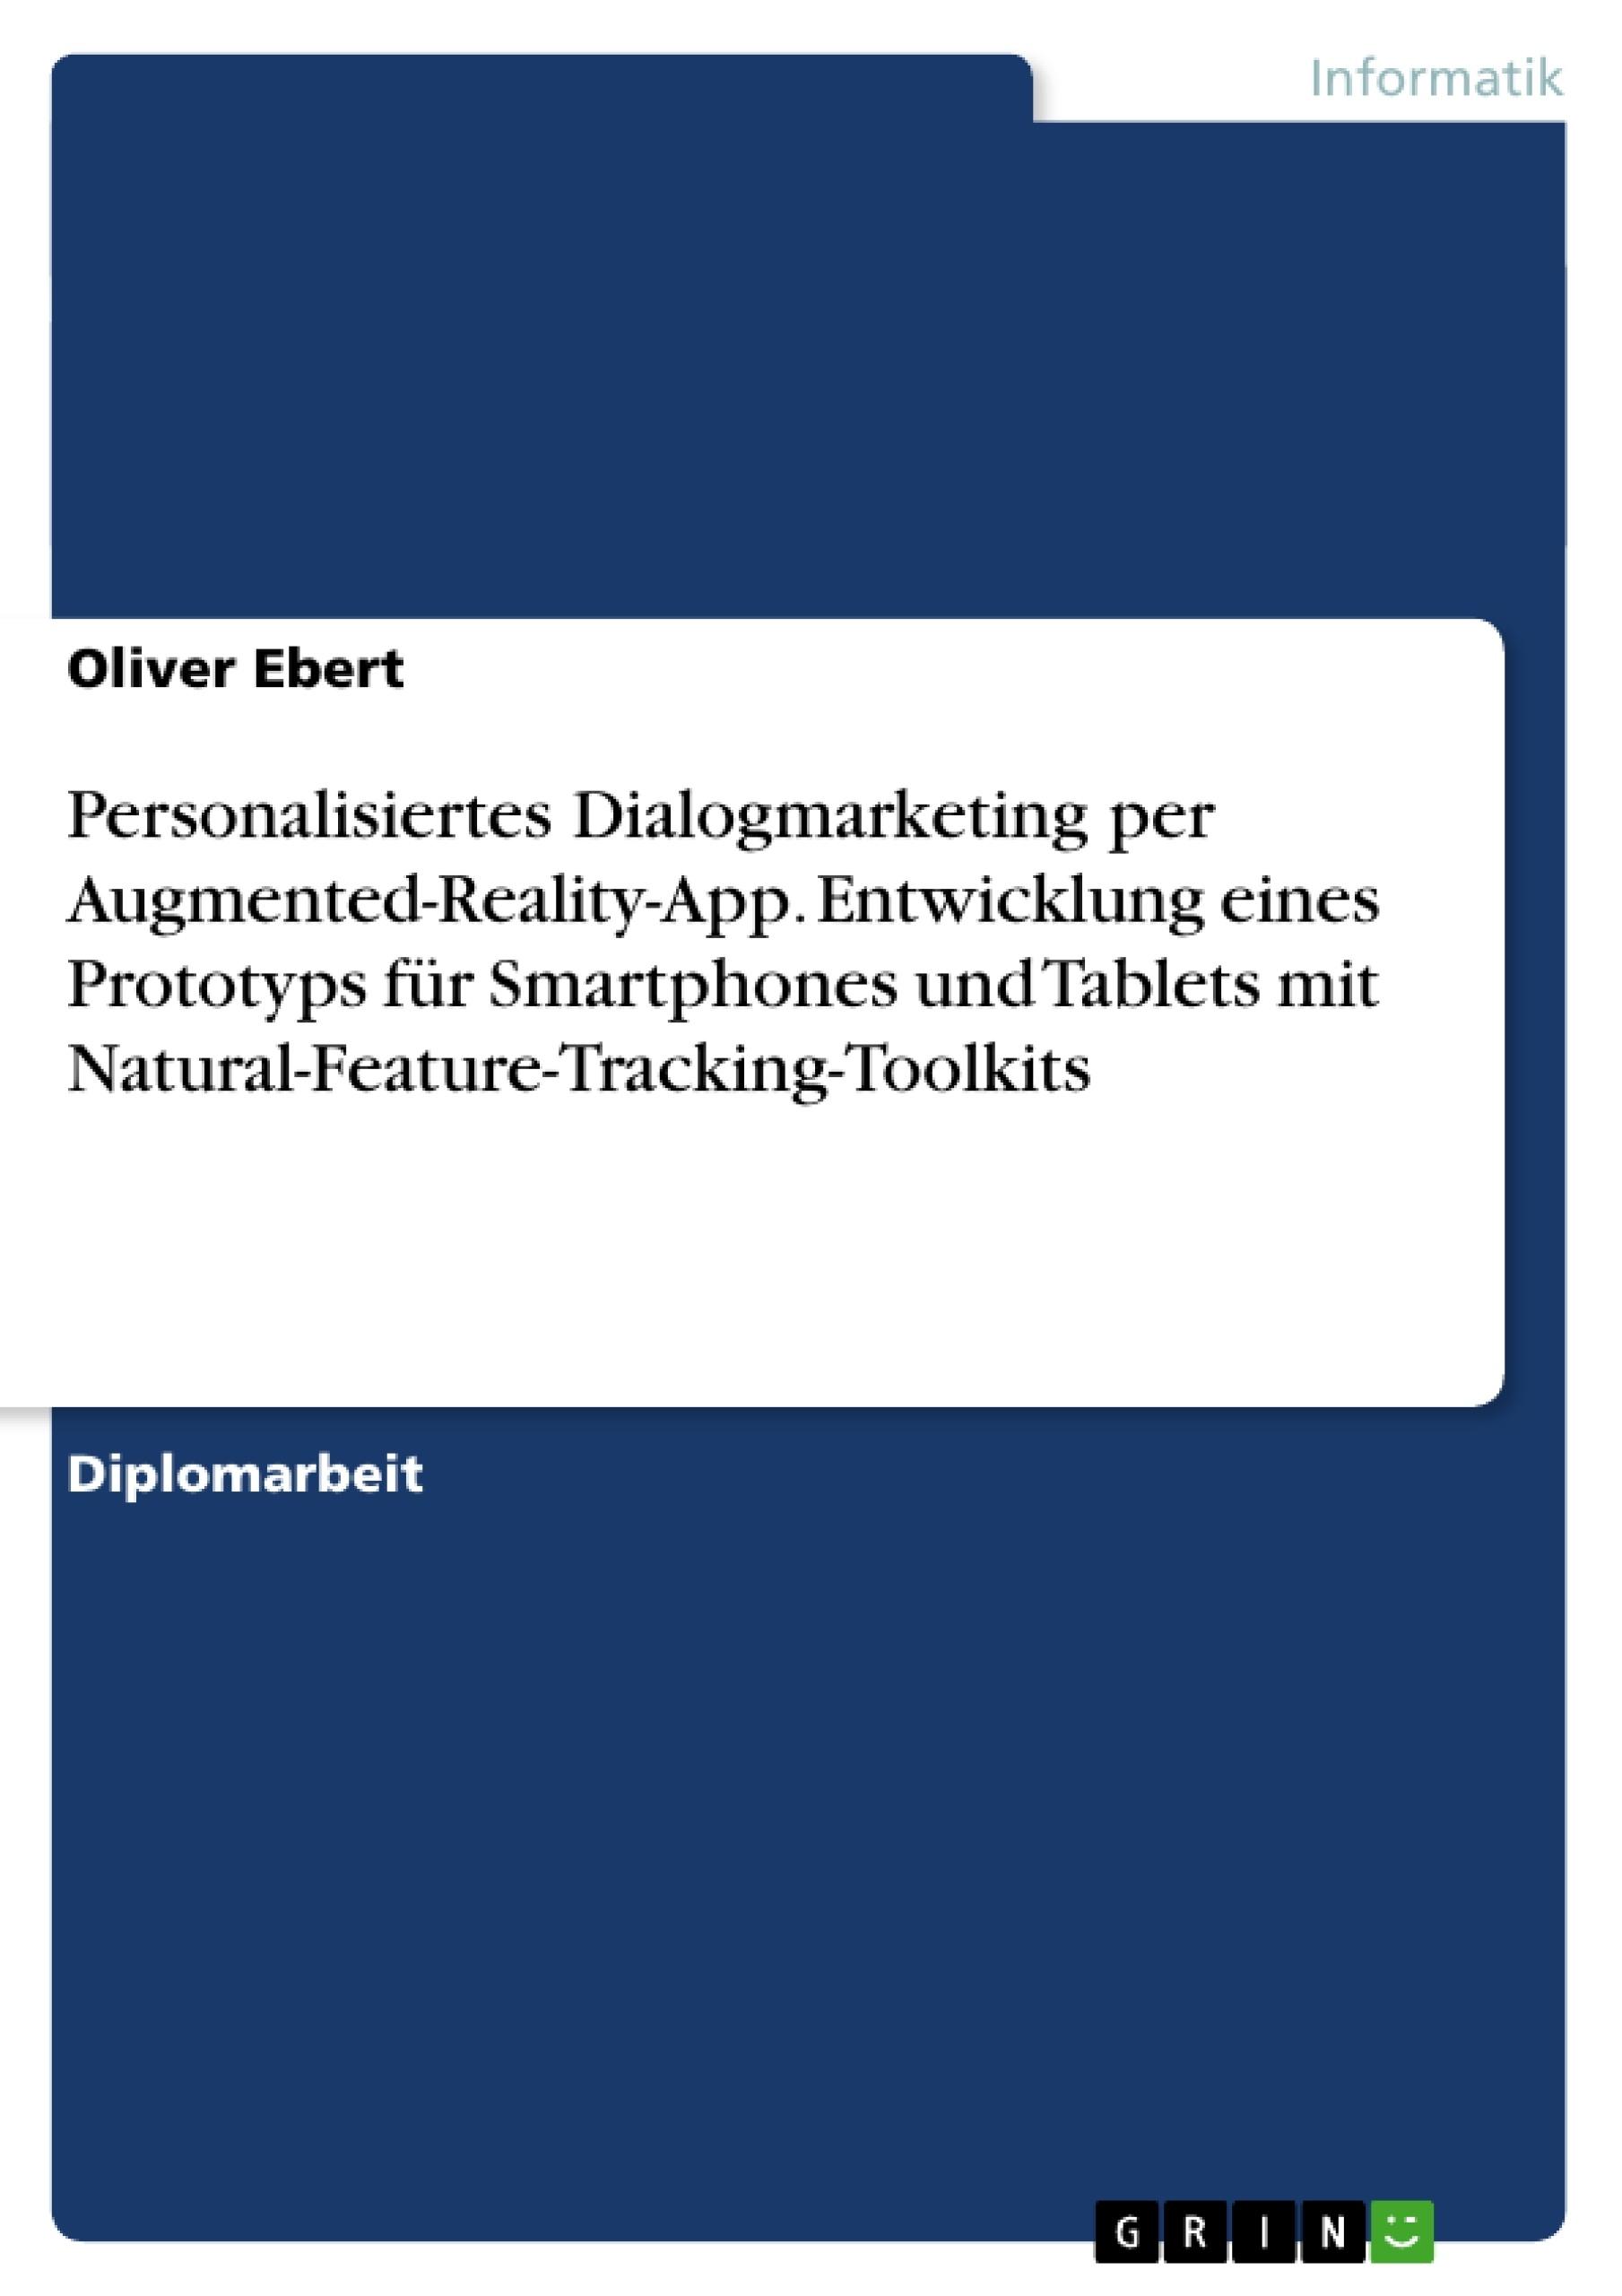 Titel: Personalisiertes Dialogmarketing per Augmented-Reality-App. Entwicklung eines Prototyps für Smartphones und Tablets mit Natural-Feature-Tracking-Toolkits